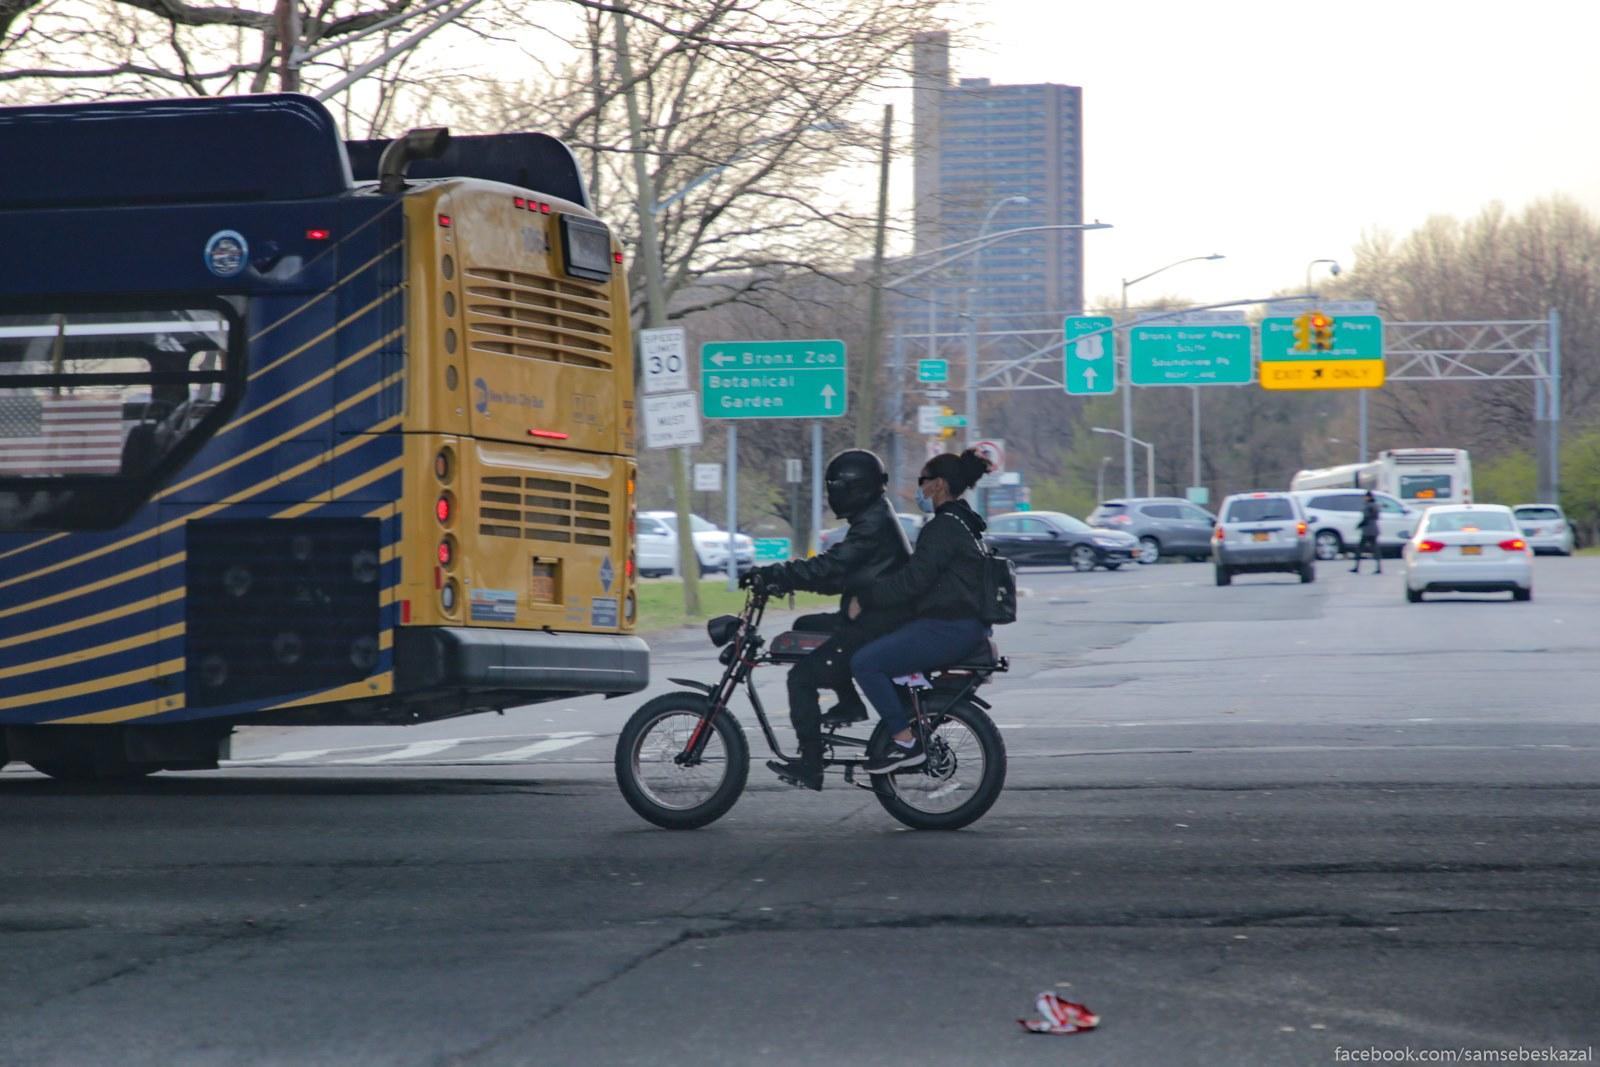 V Bronkse vse kak obycno i daze bolʹse. Motociklistov kakoe-to ogromnoe kolicestvo povylazilo.